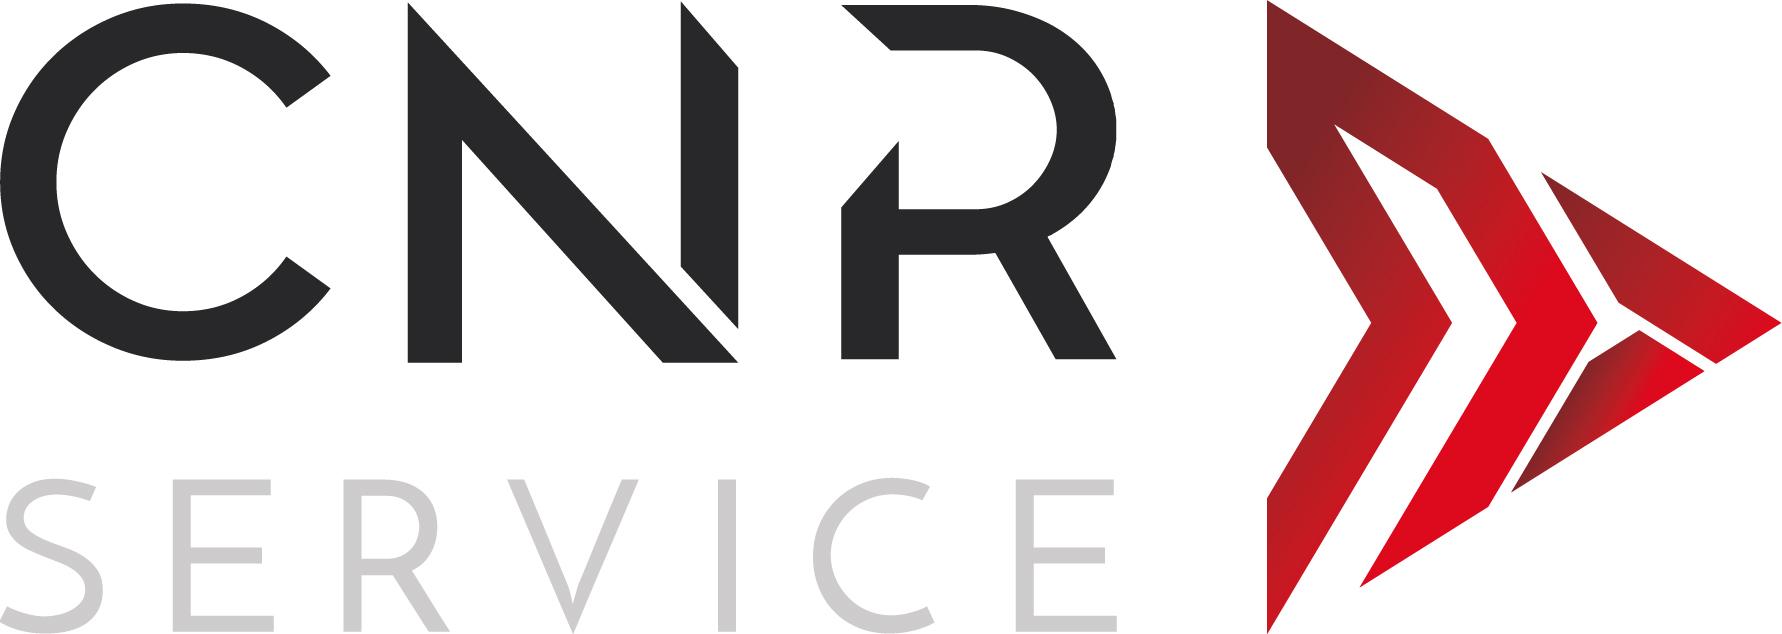 Cnr Service